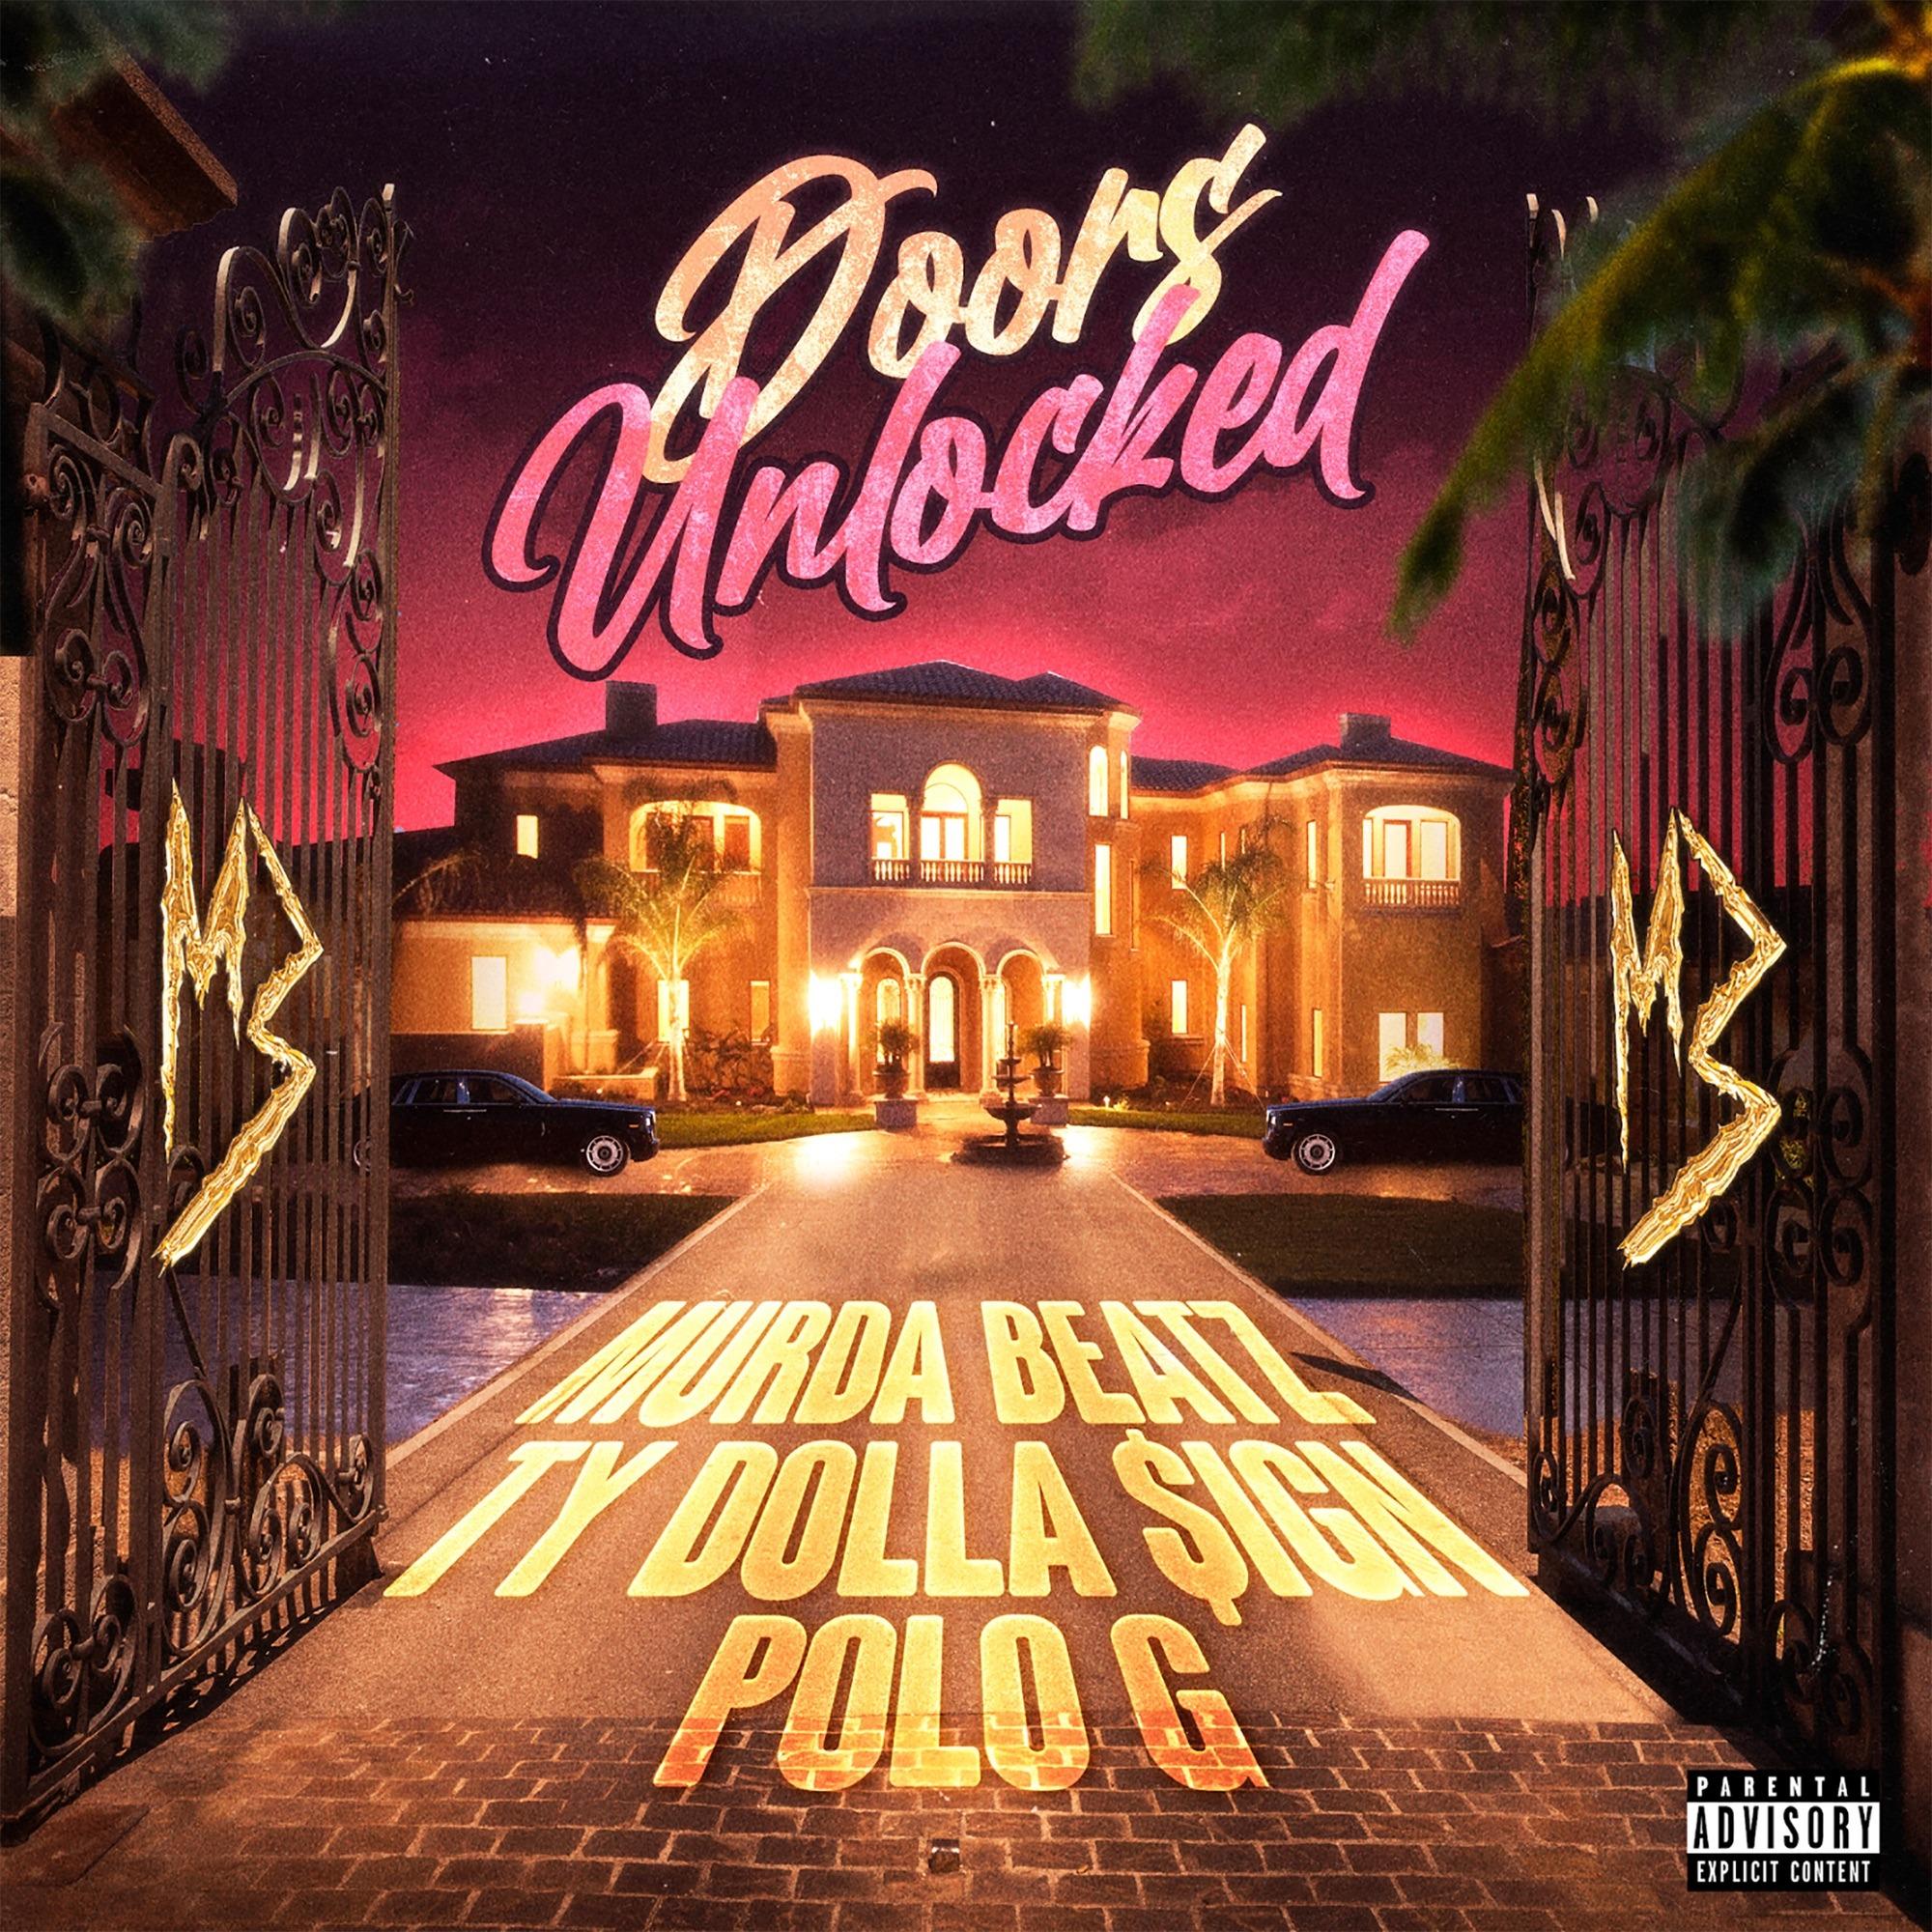 Murda Beatz feat. Ty Dolla $ign & Polo G - Doors Unlocked